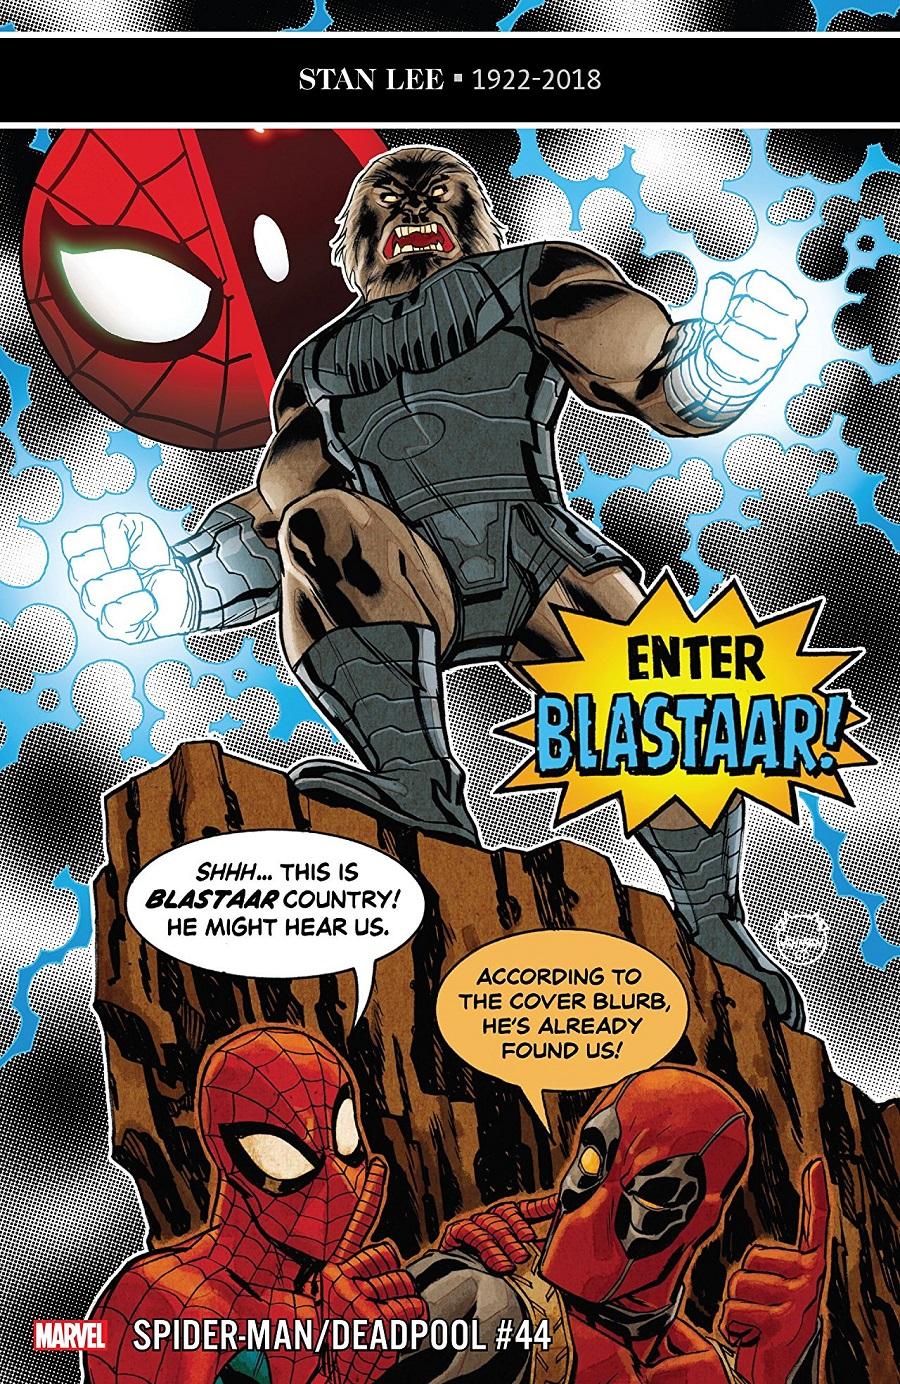 Previews: October 16th, 2019 - Spider Man Crawlspace